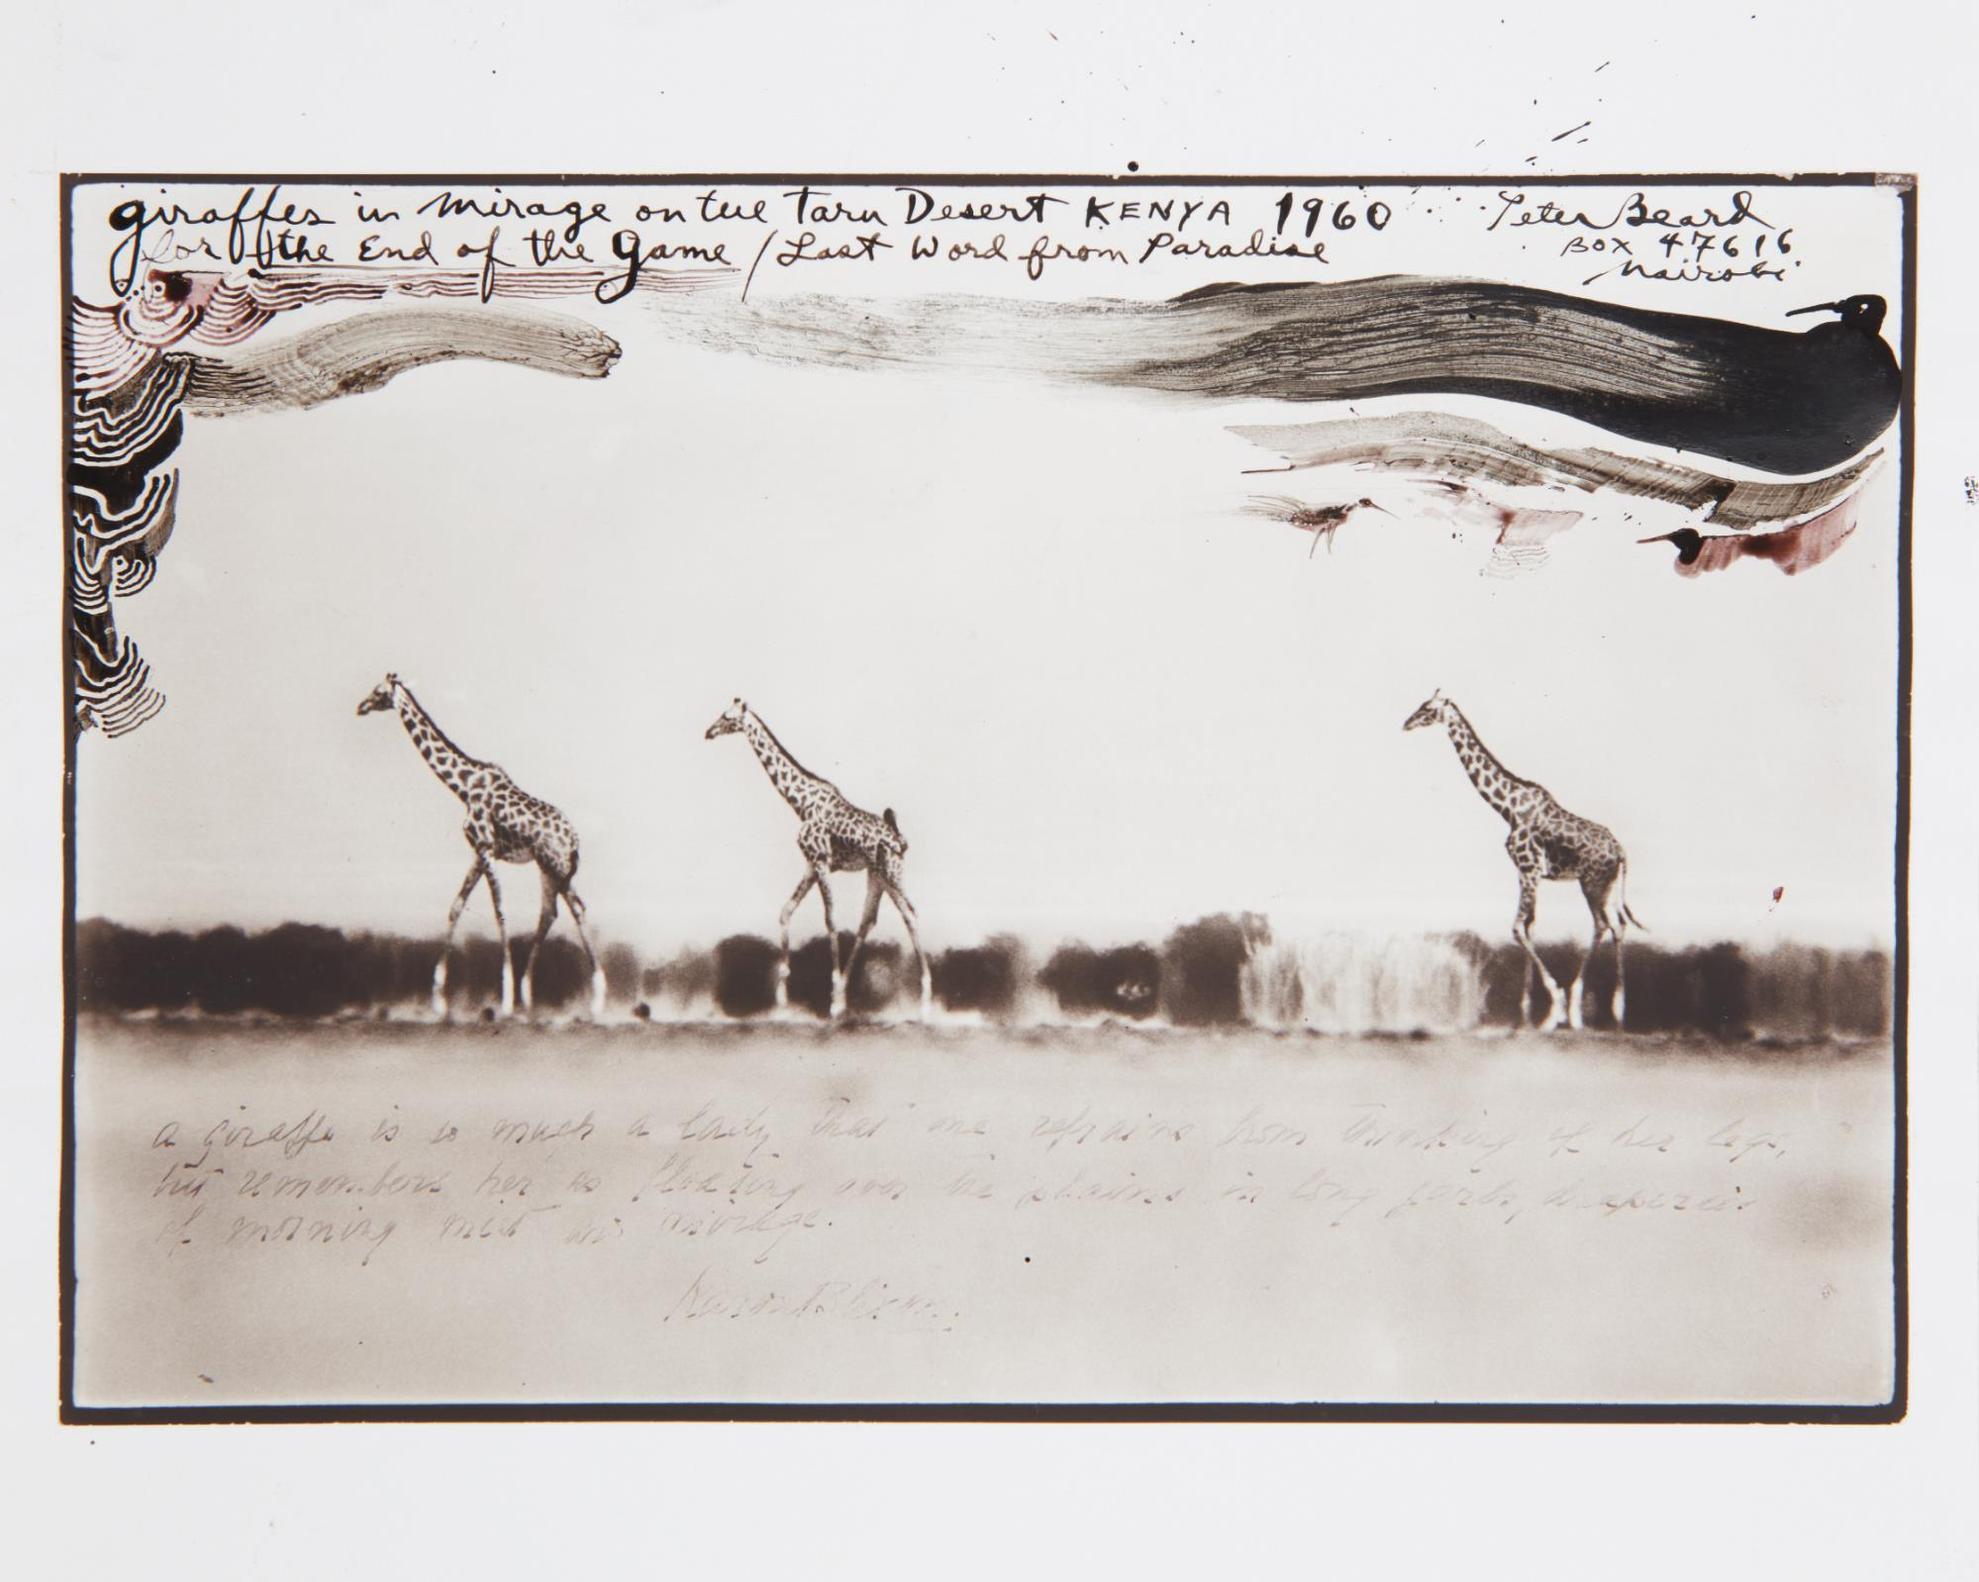 Peter Beard-Giraffes In Mirage On The Tara Desert Kenya For The End Of The Game/Last Word From Paradise-1960